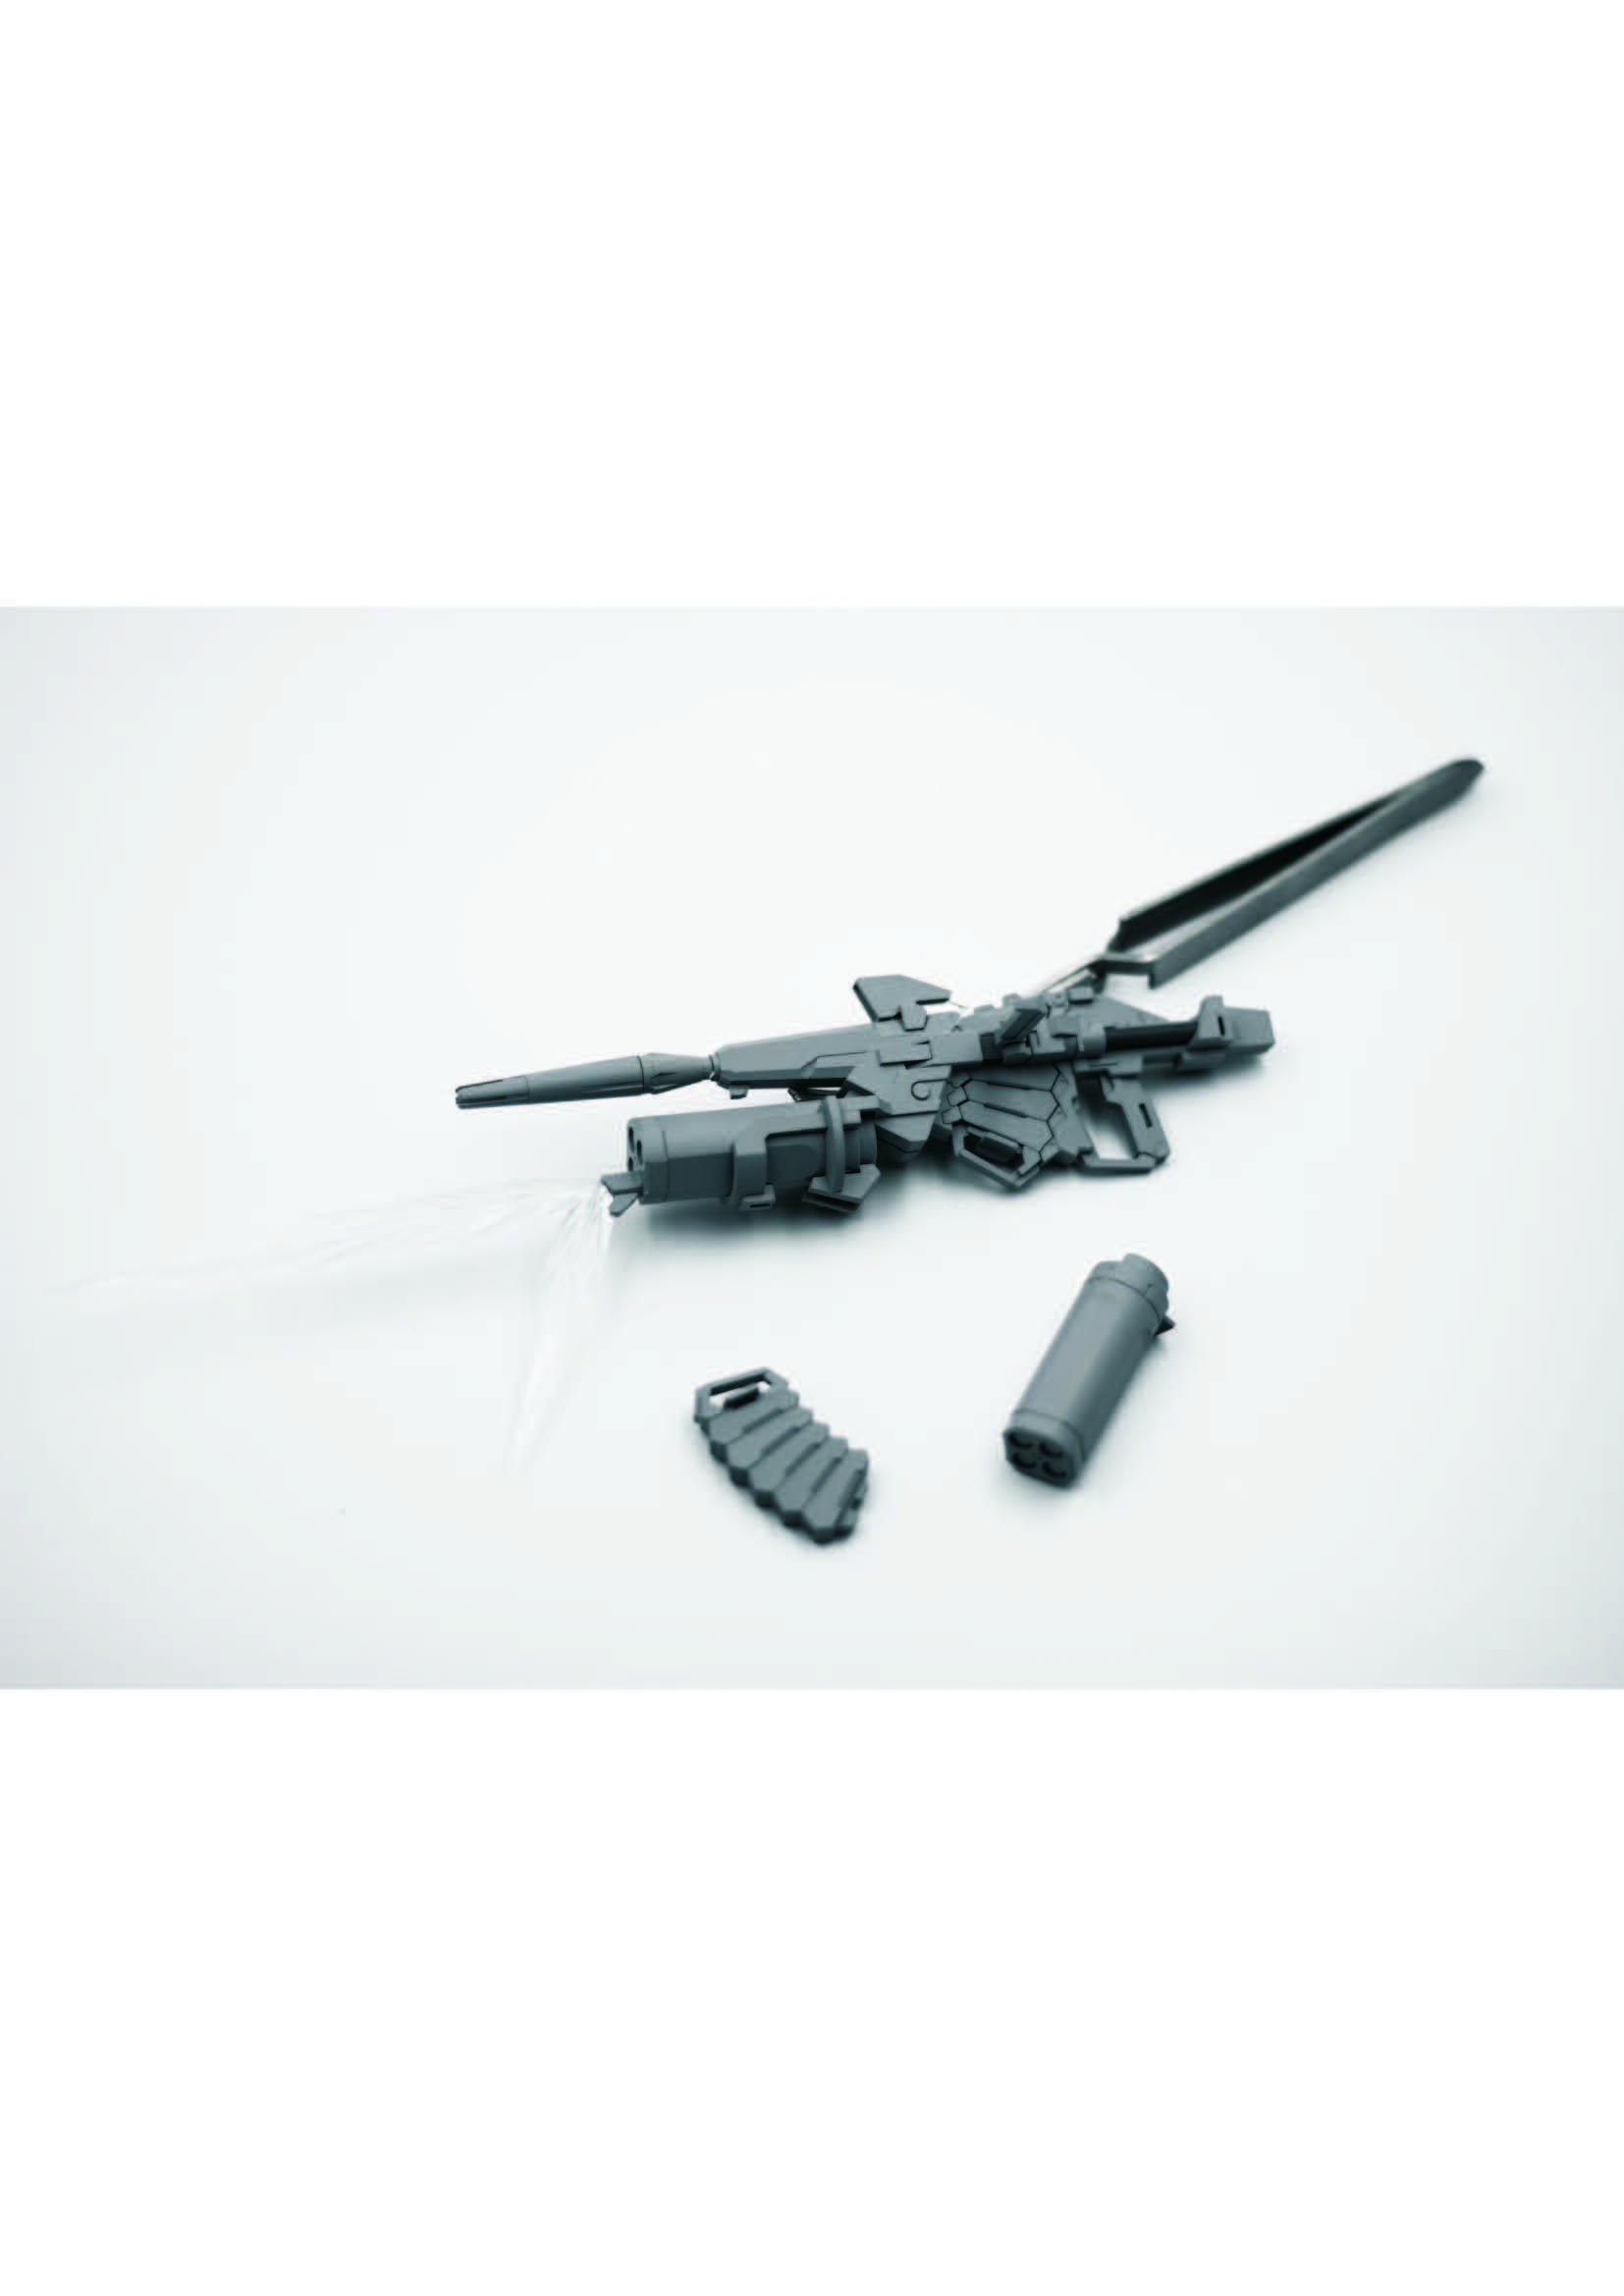 G383_info_weapons_ページ_09